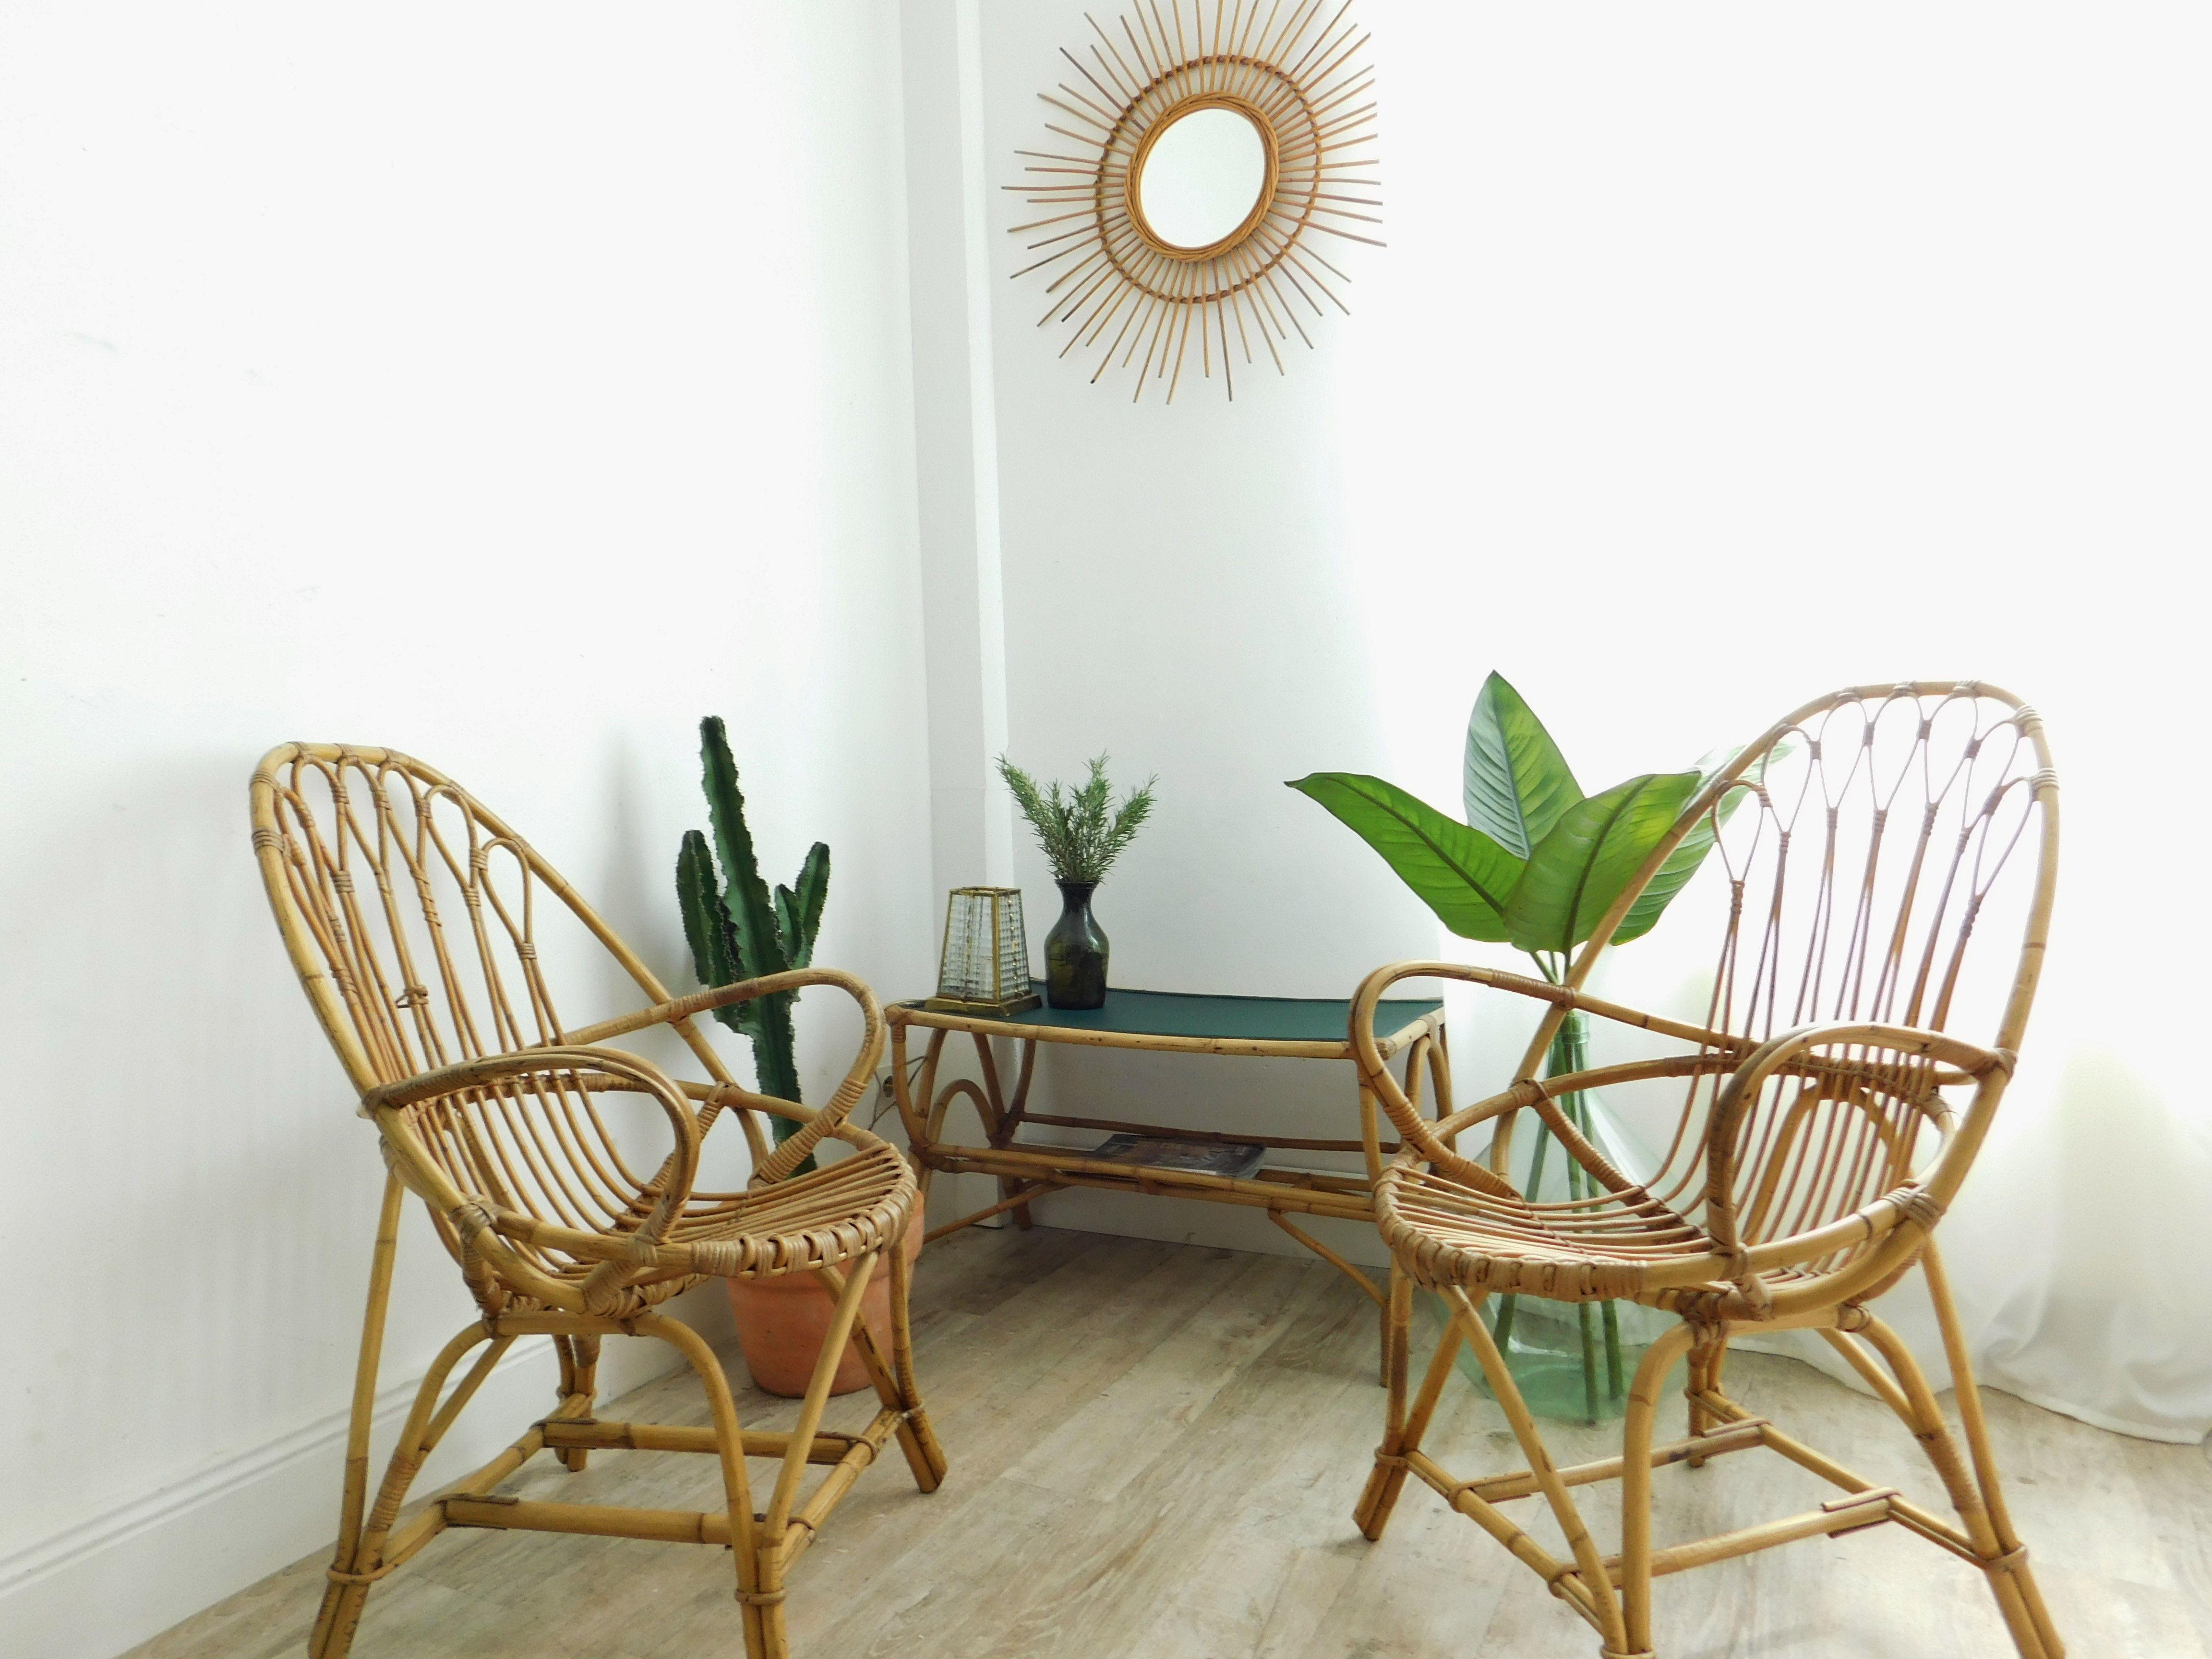 2 fauteuils en rotin vintage ovo des ambiance nature vert profond jungle inspirations d co. Black Bedroom Furniture Sets. Home Design Ideas